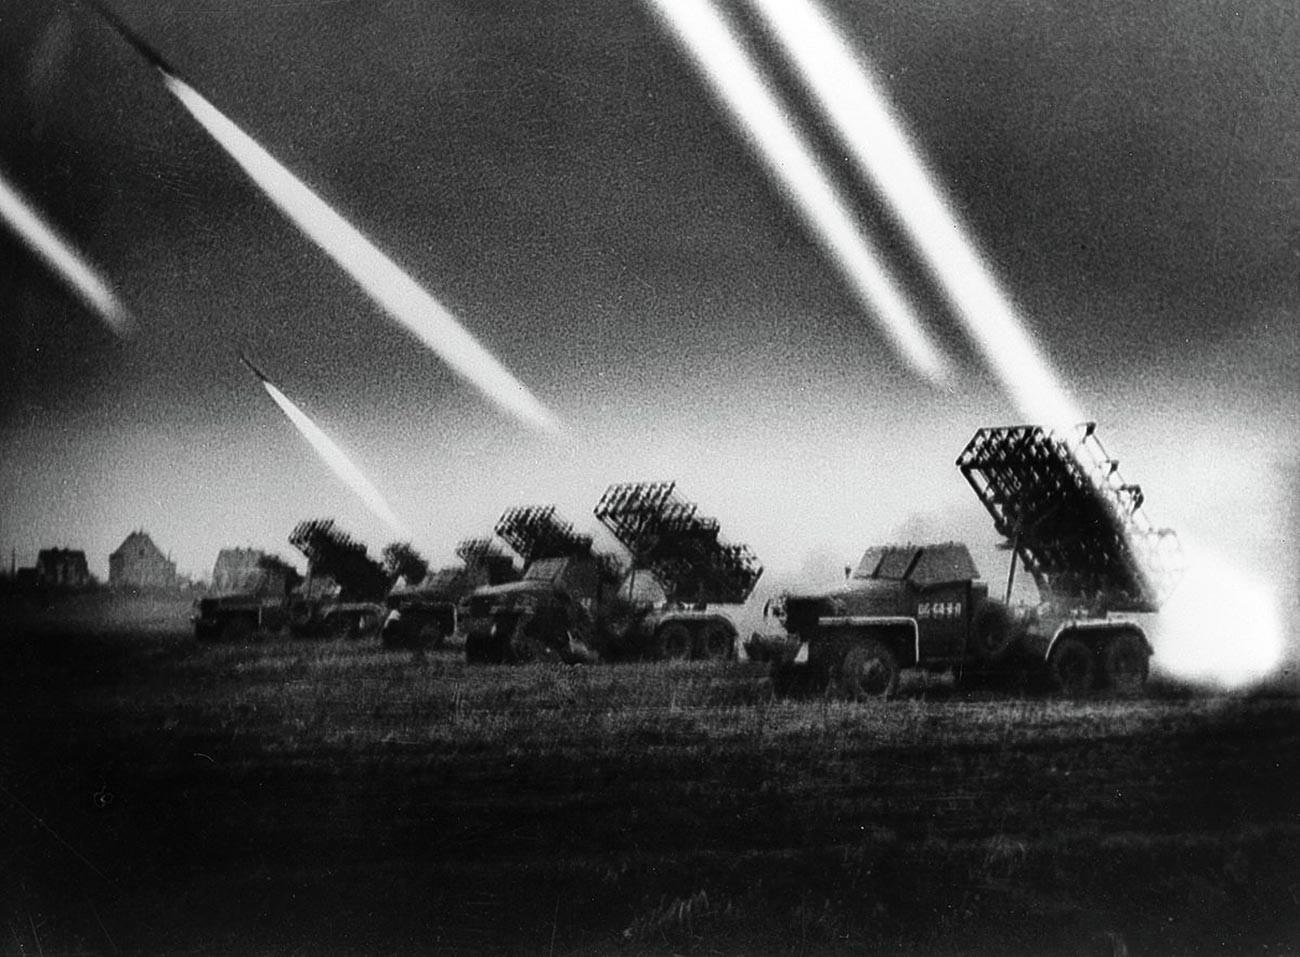 Katyusha rocket launchers in action.